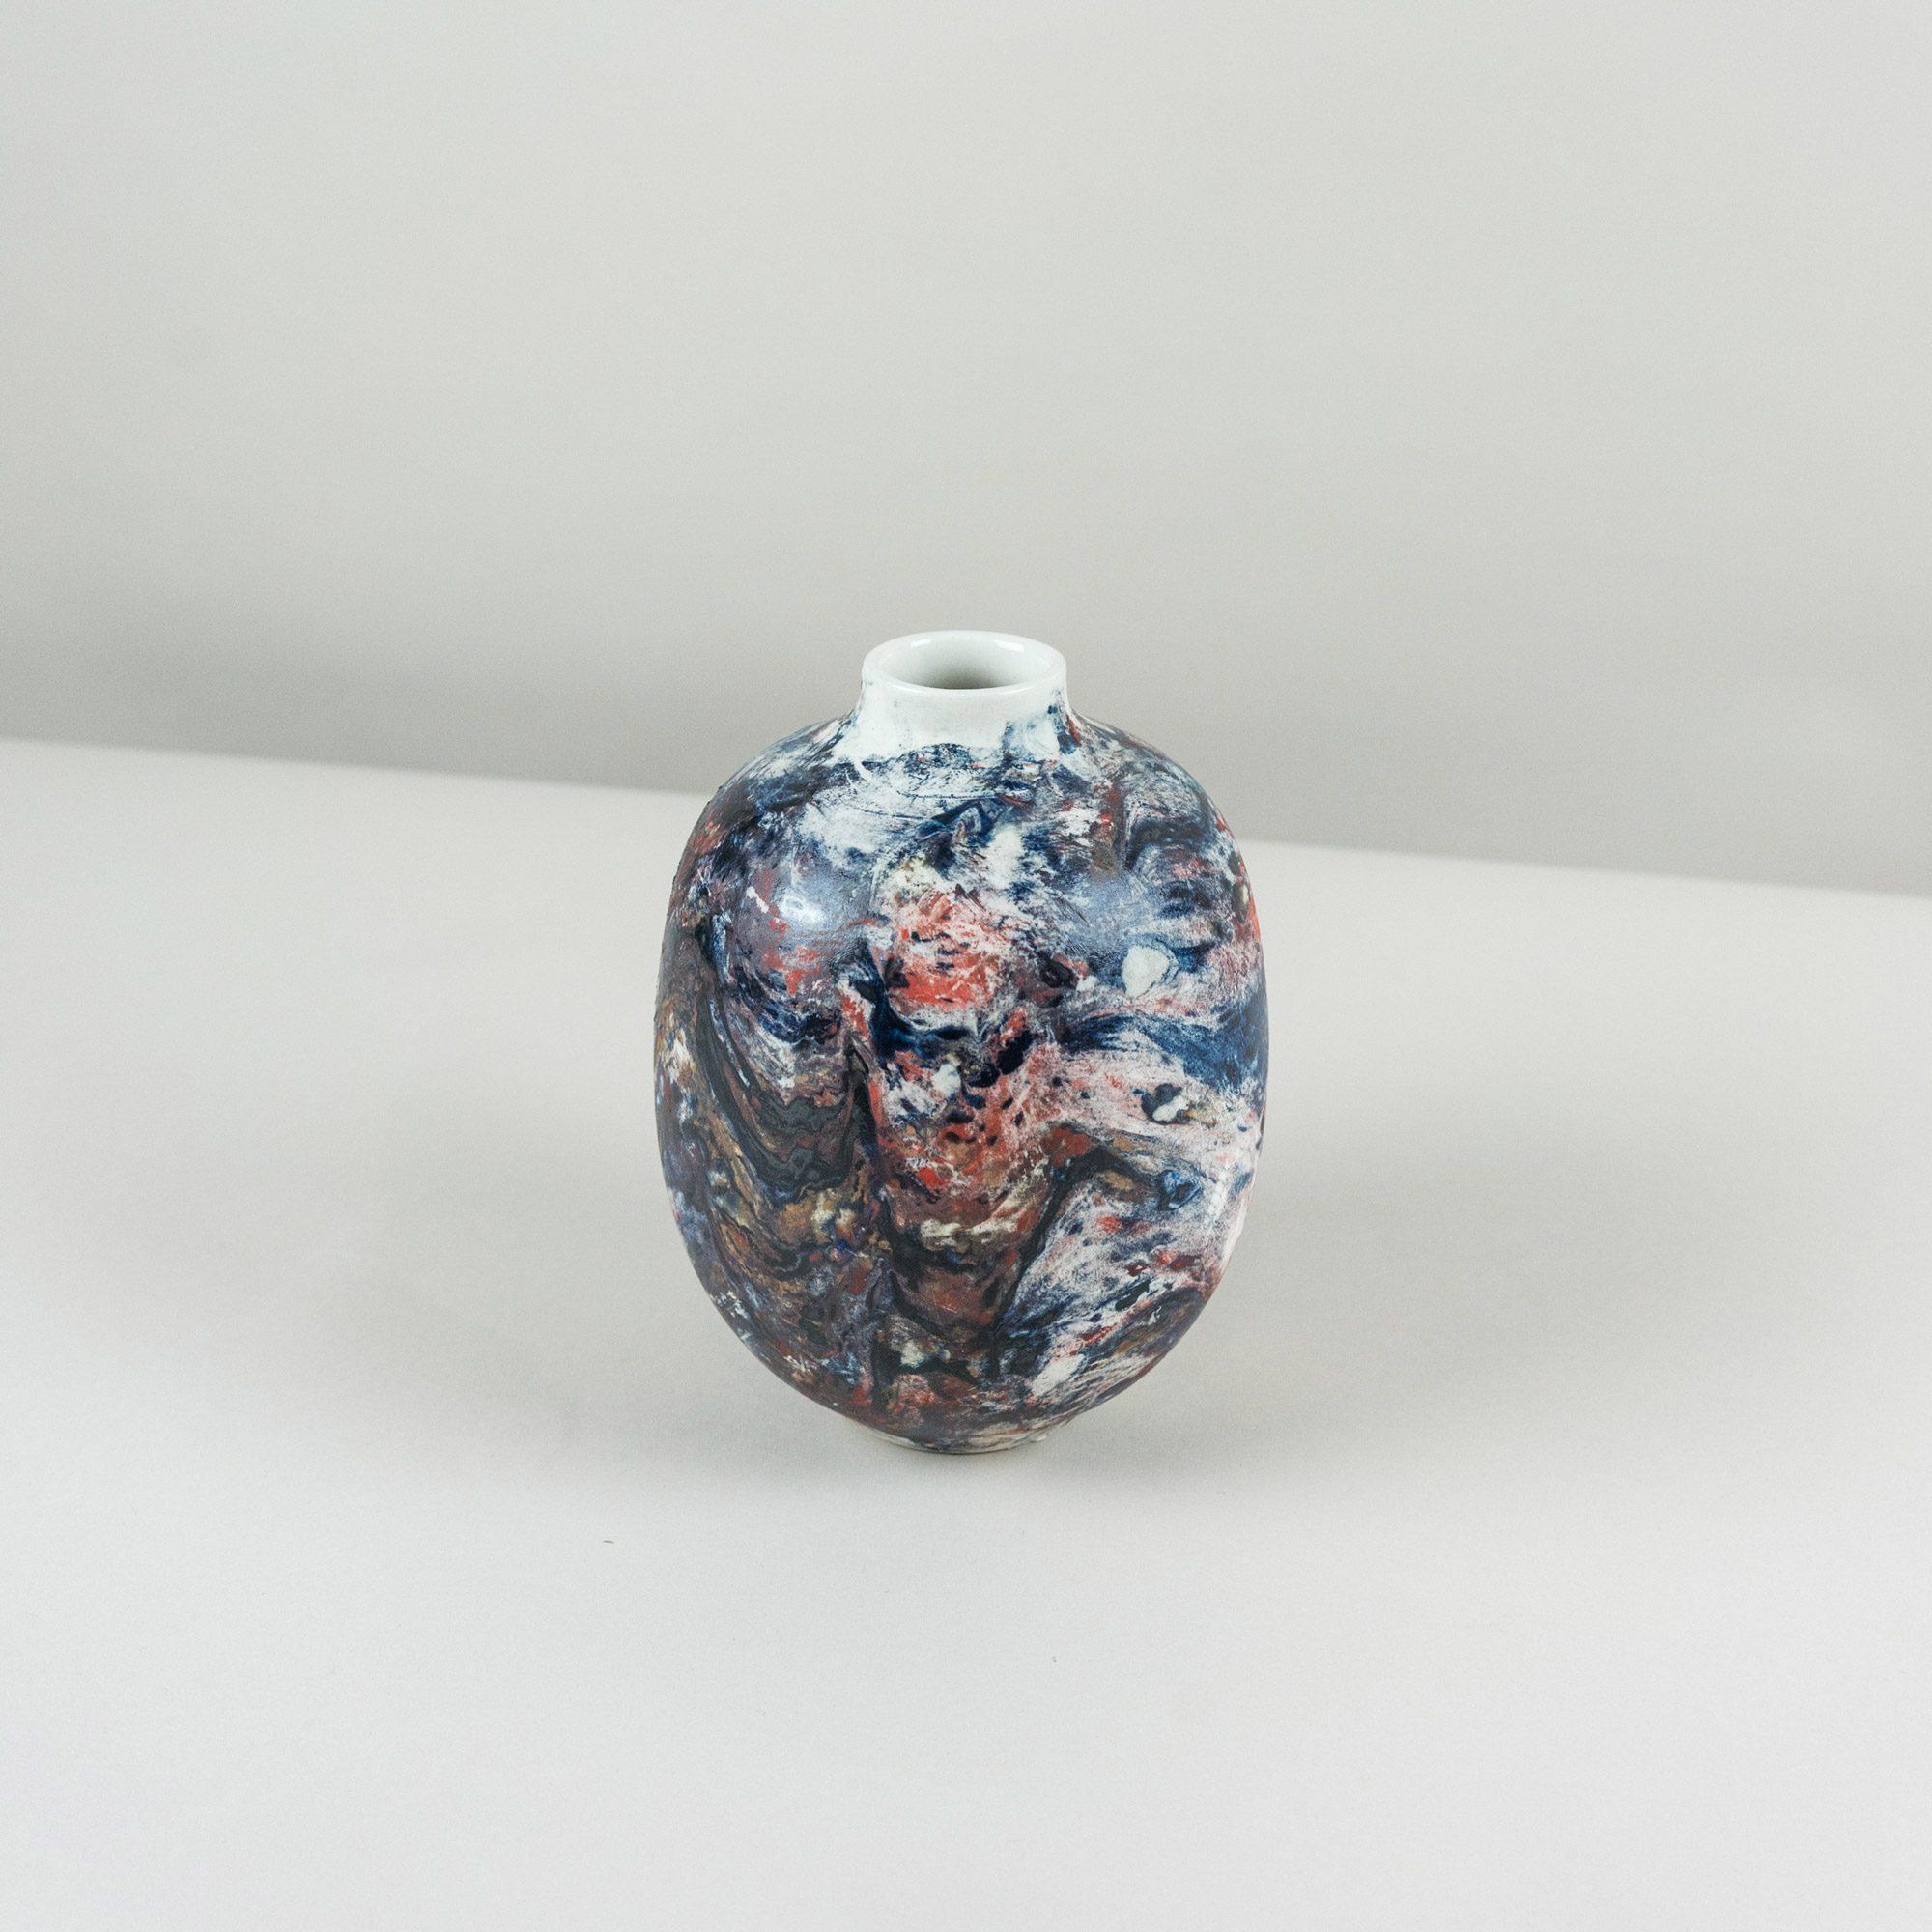 Dark- coloured handmade vase by Veronika Svabenikova